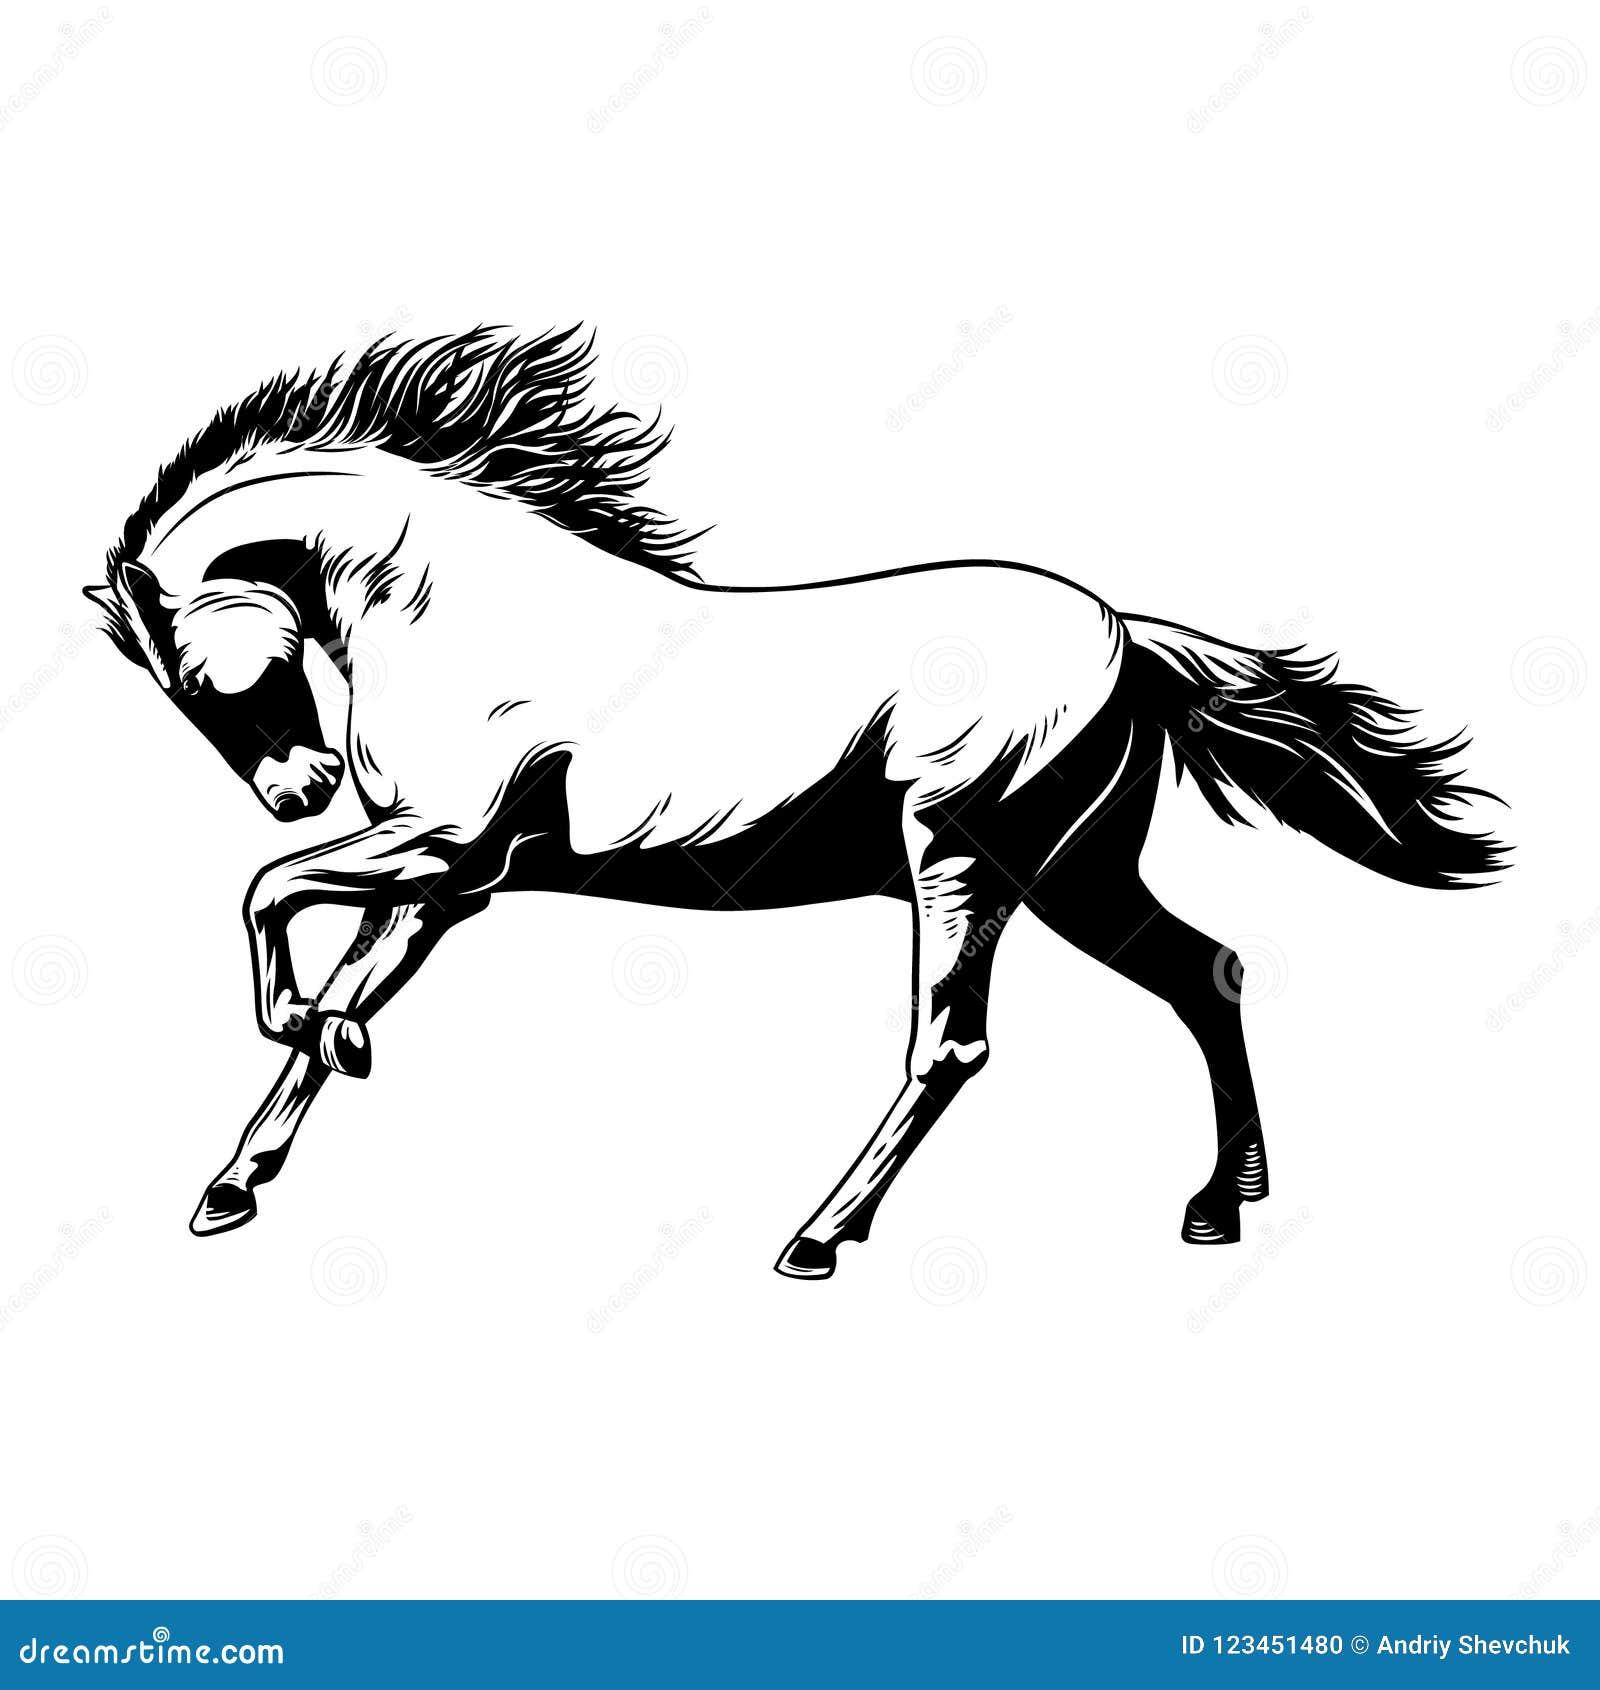 Horse White Black Vector Illustration Beautiful Horse Racing Stock Vector Illustration Of Isolated Grayscale 123451480